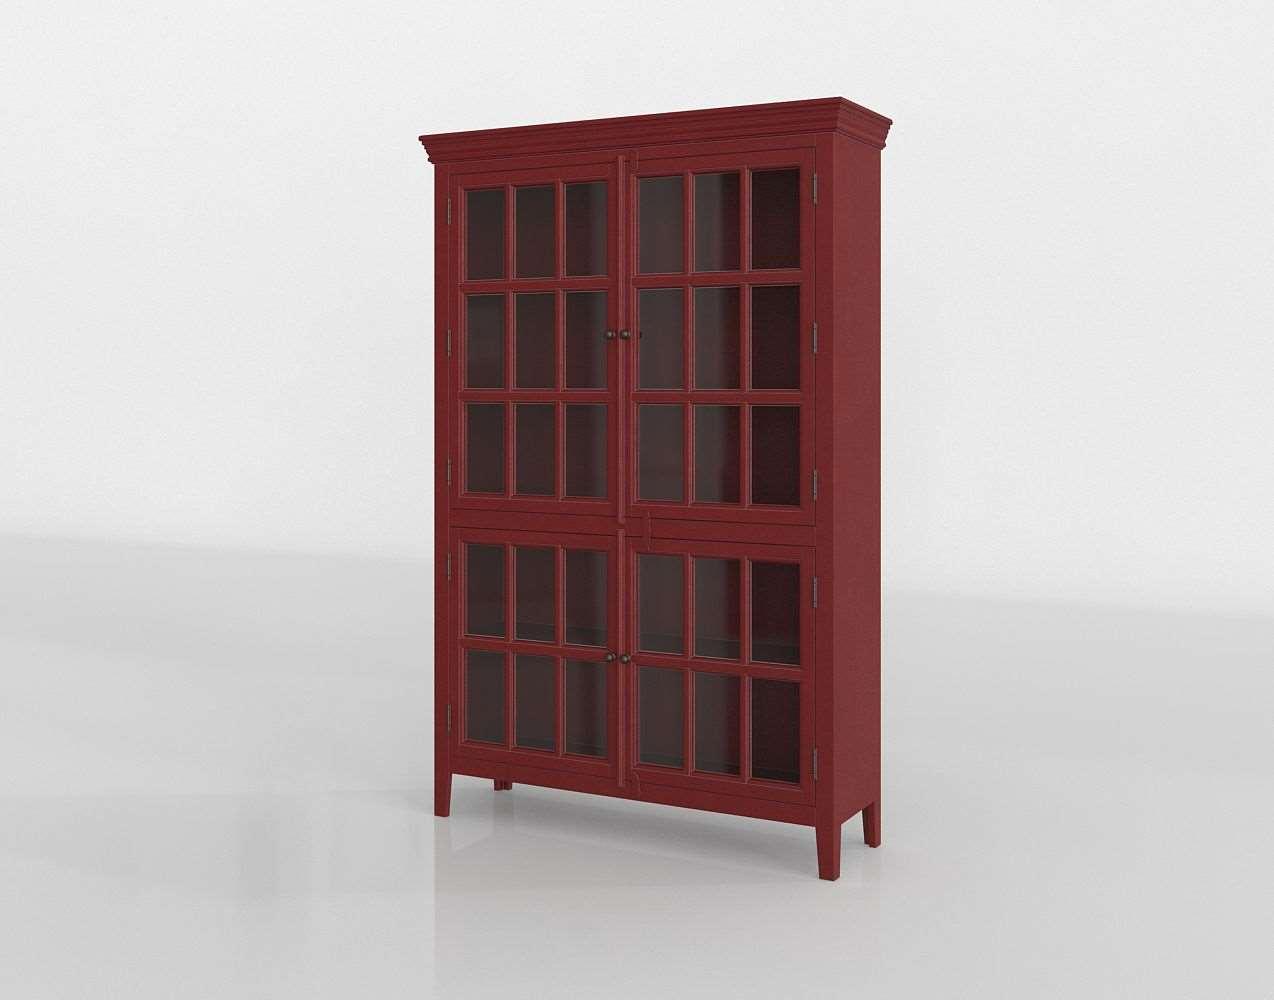 3d Rojo Tall Cabinet Interior Decor Glancing Eye